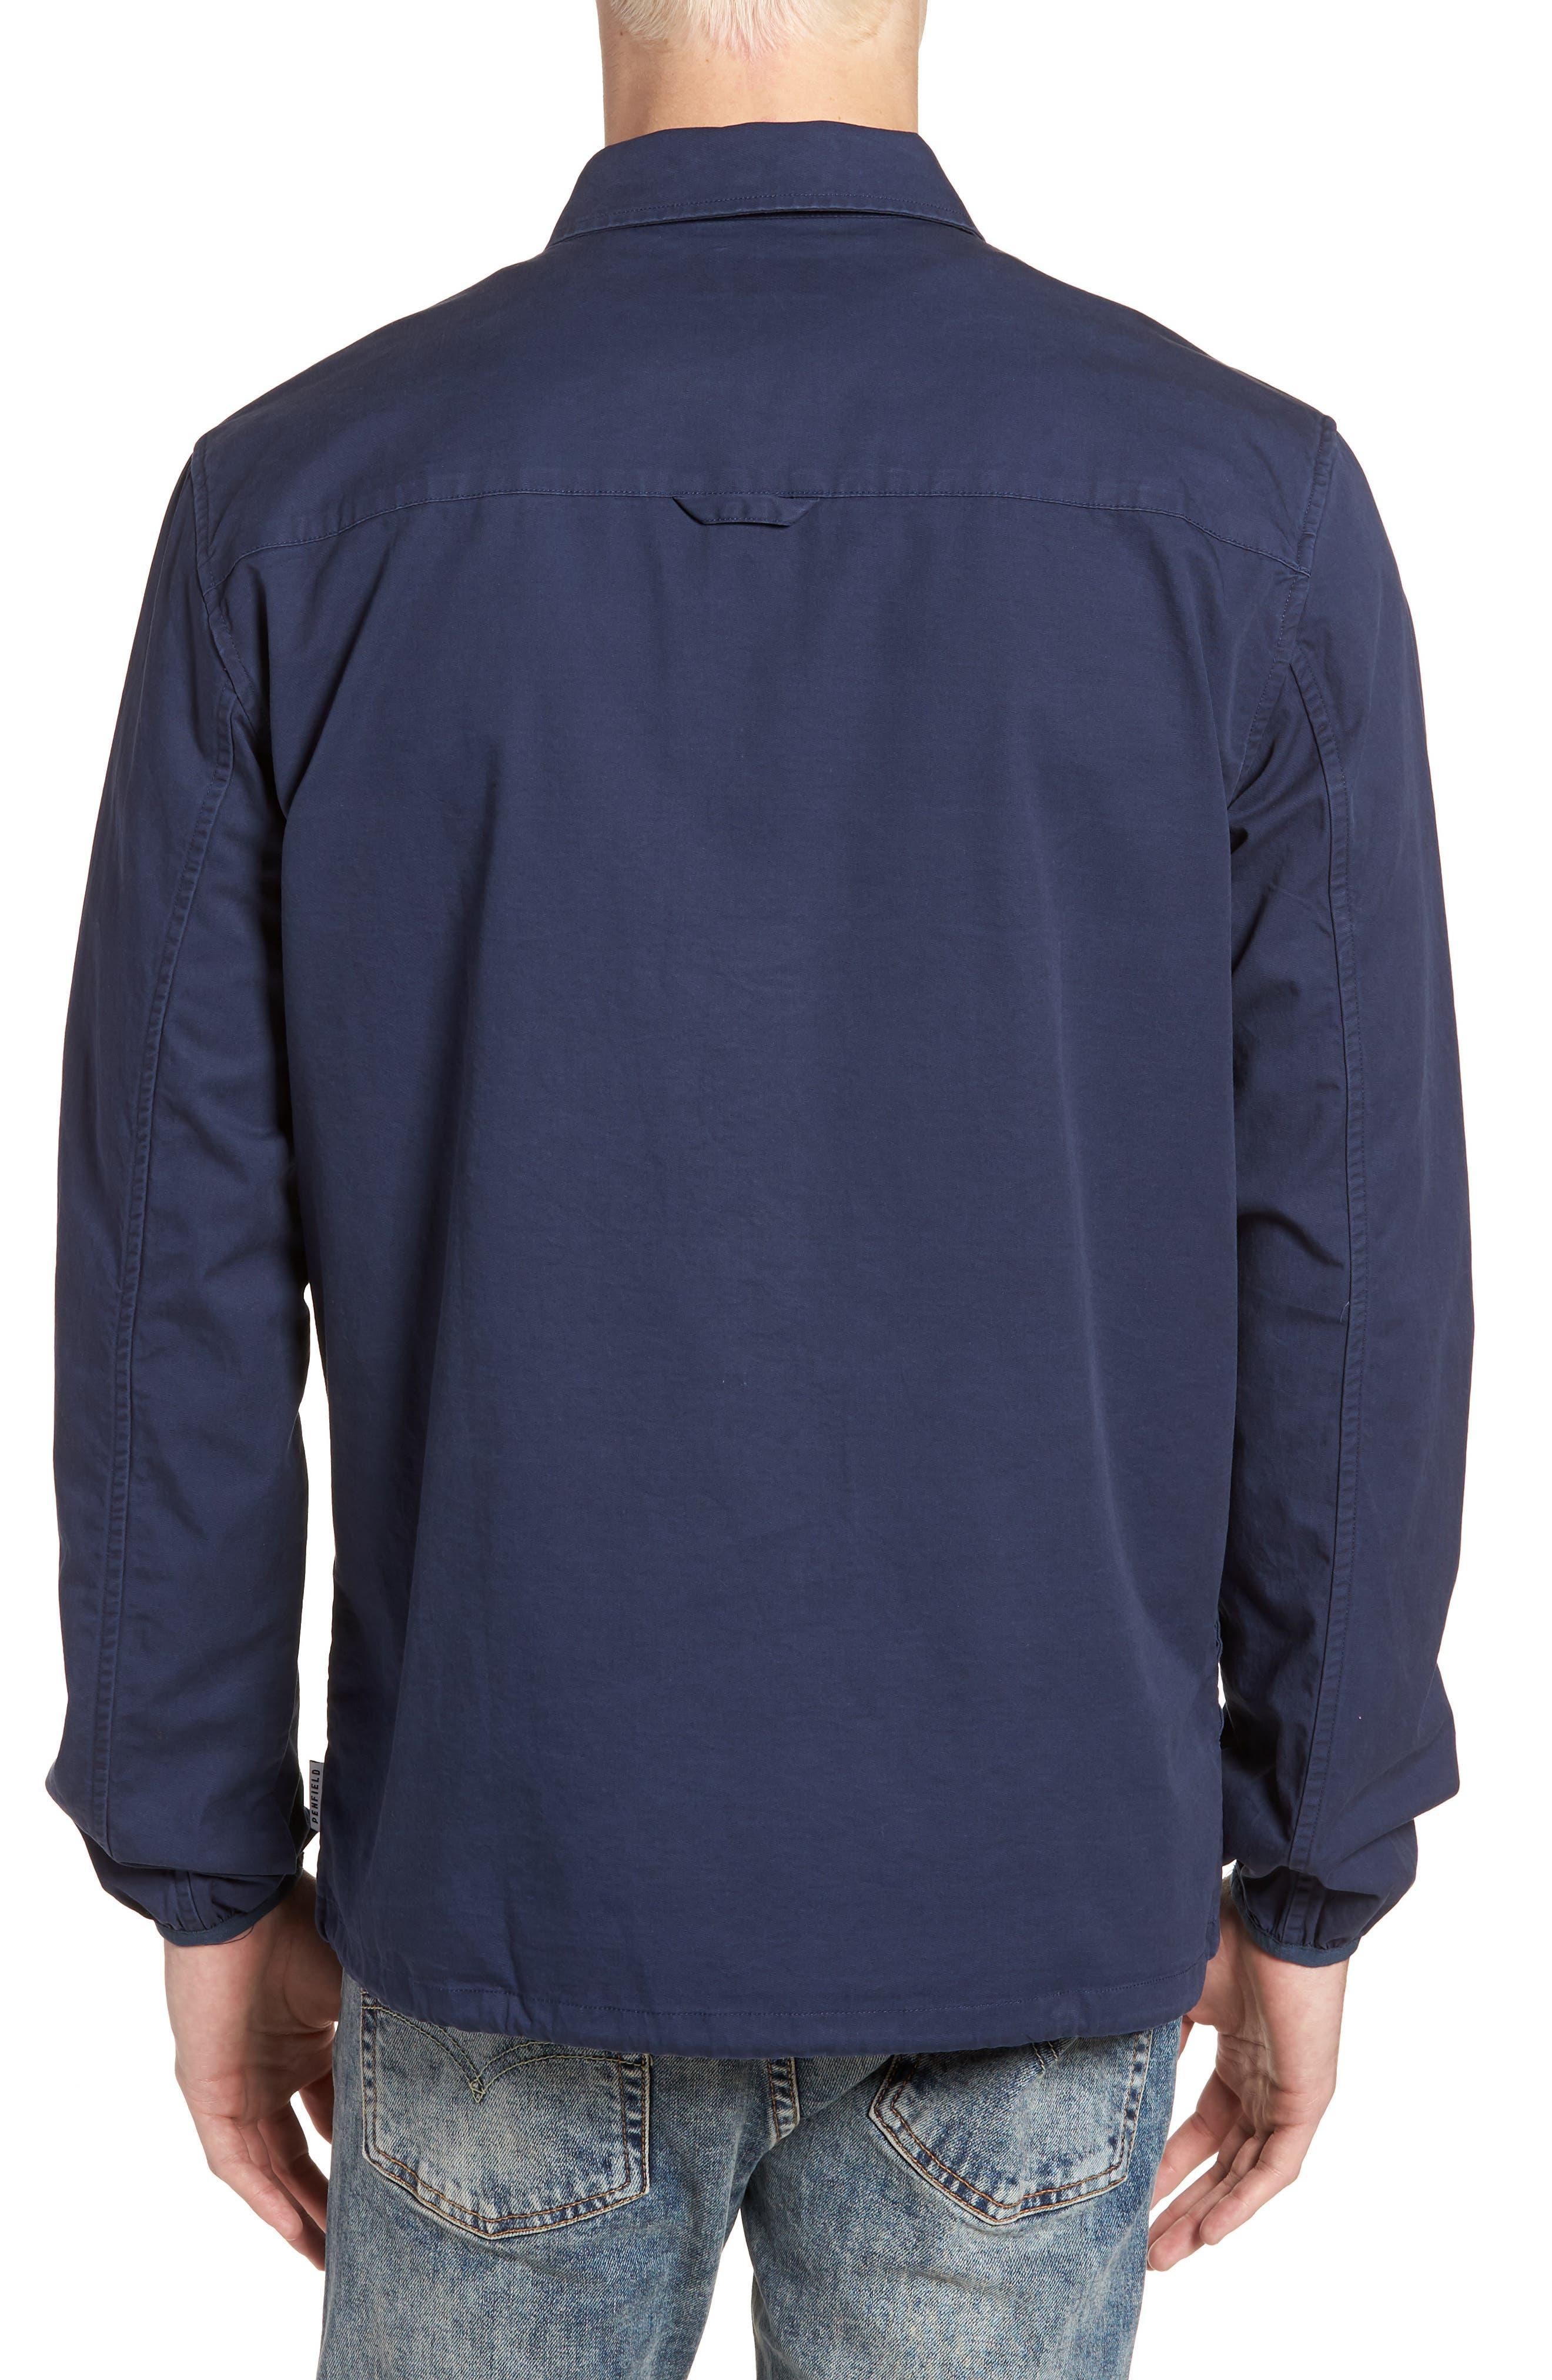 Blackstone Shirt Jacket,                             Alternate thumbnail 2, color,                             Navy